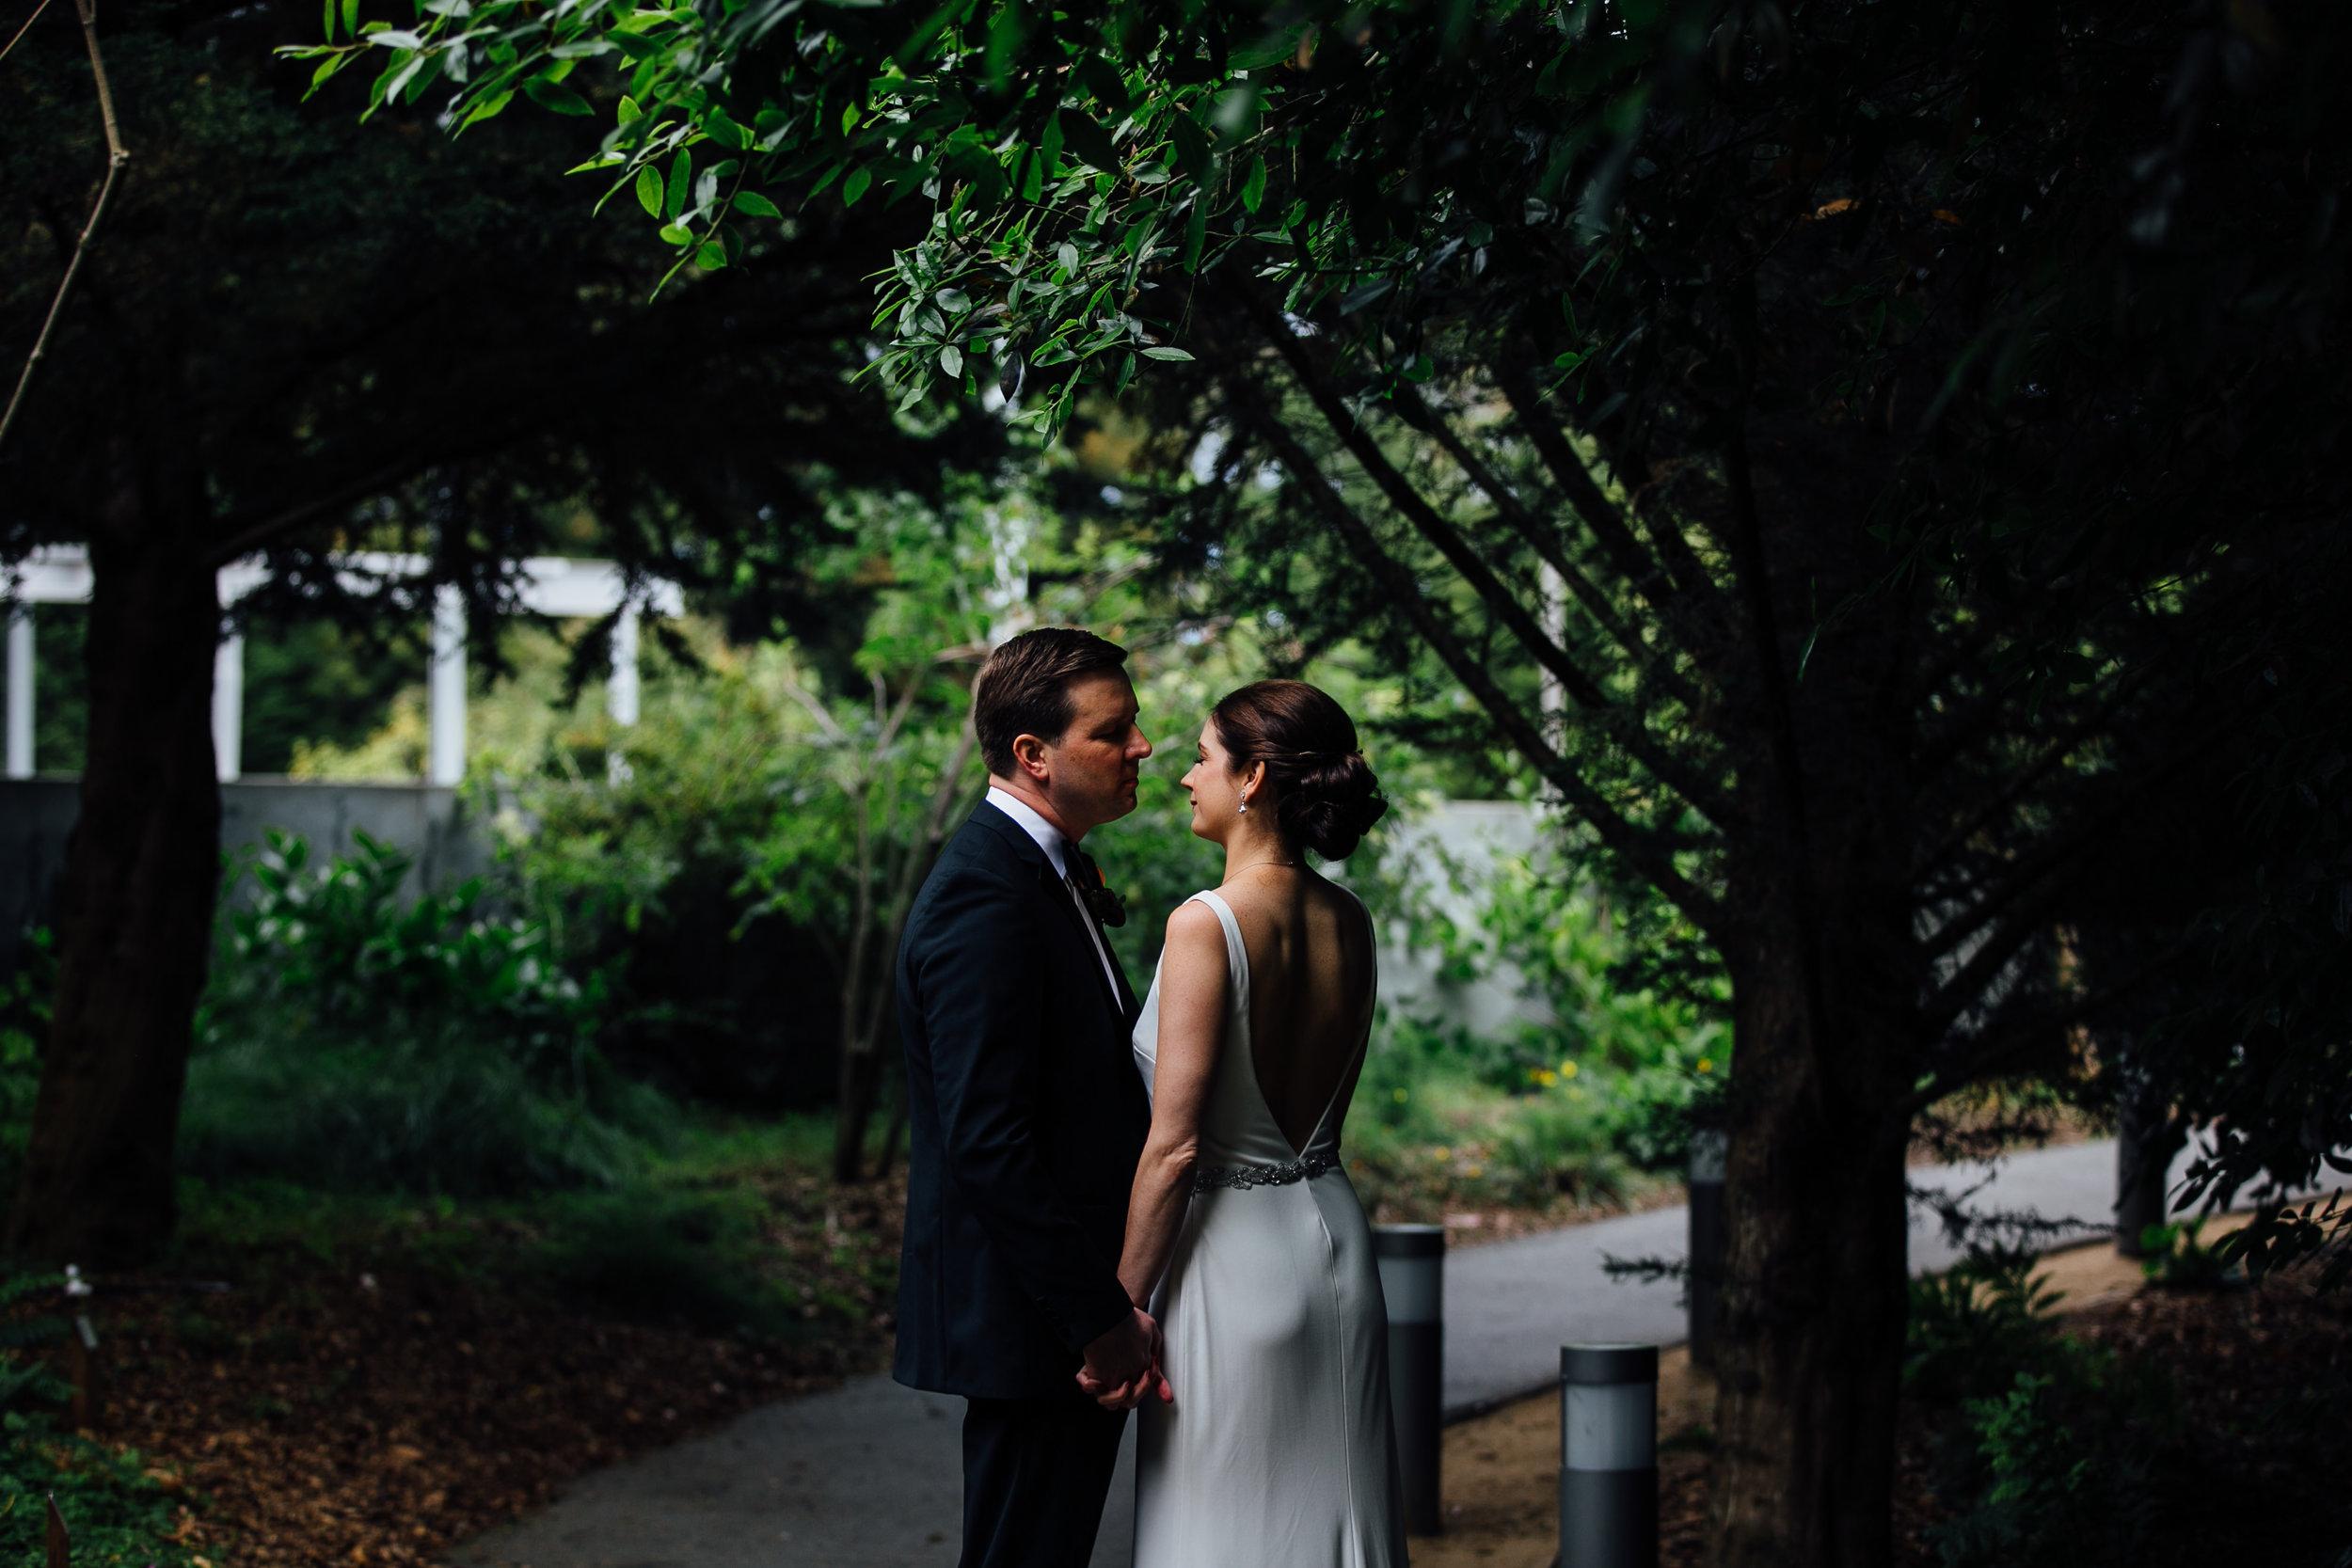 Wedding_KathleenMichael_BG_Portraits-213.jpg